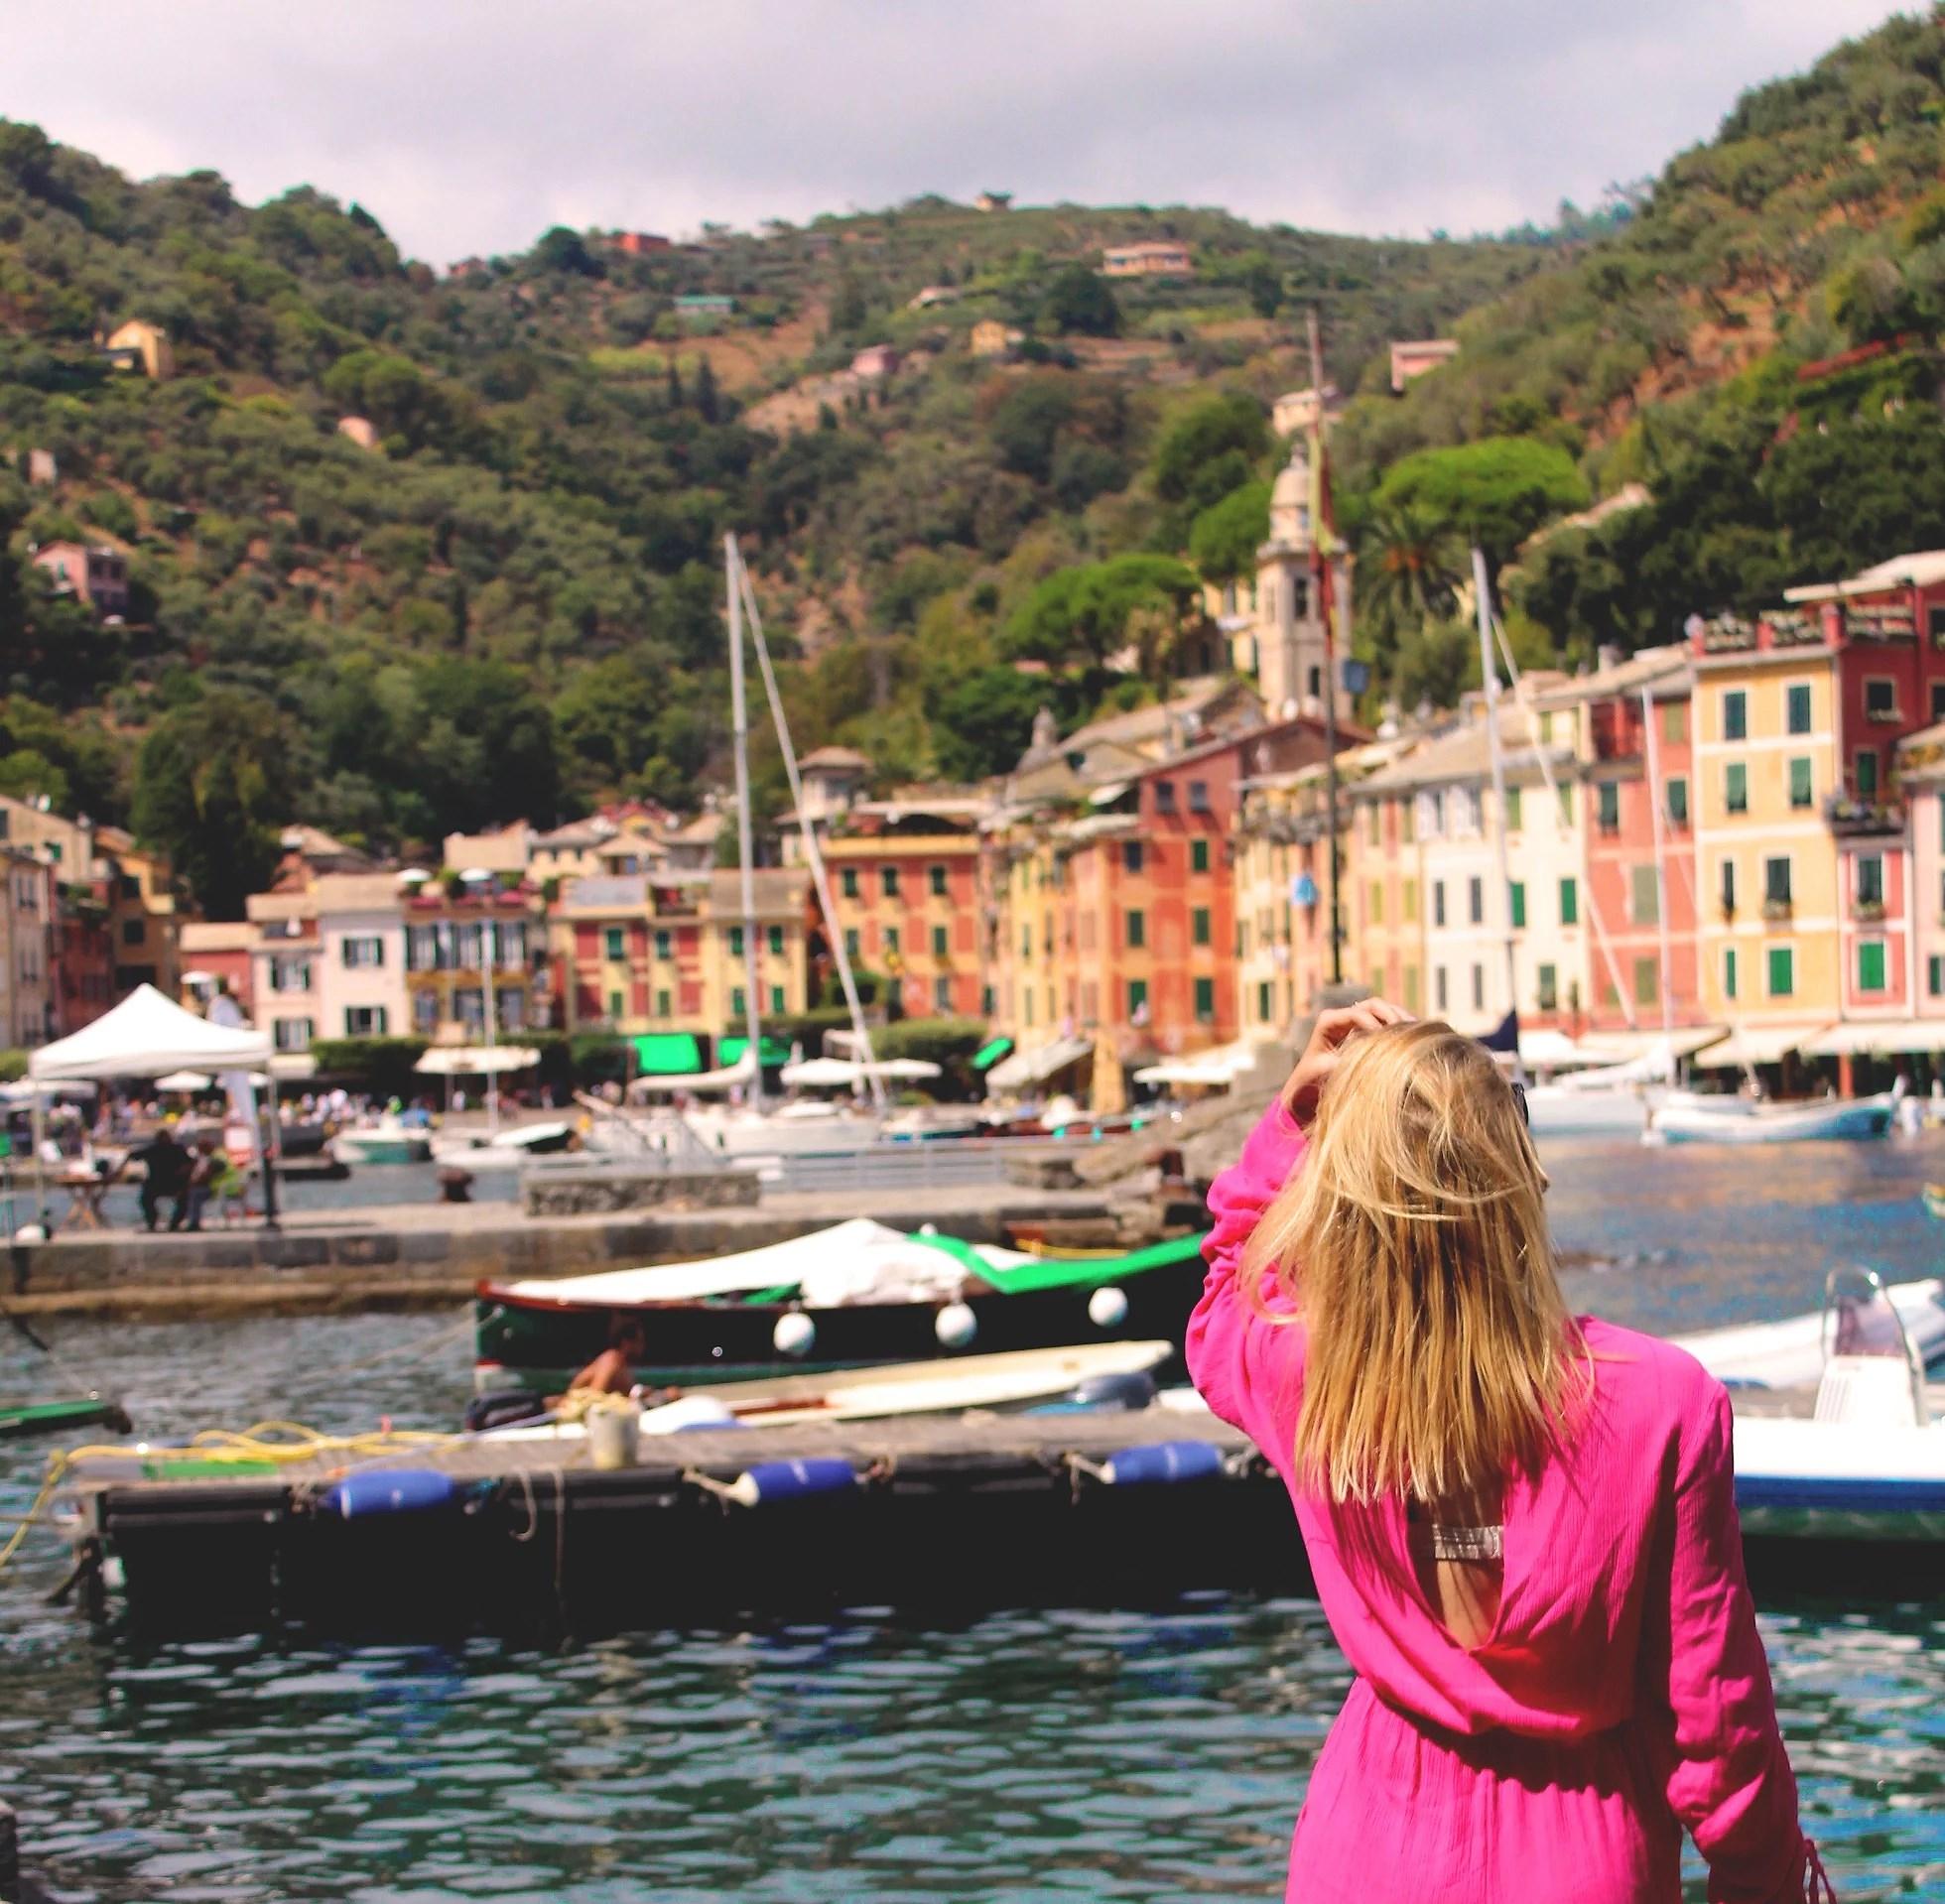 Portofino postcards!